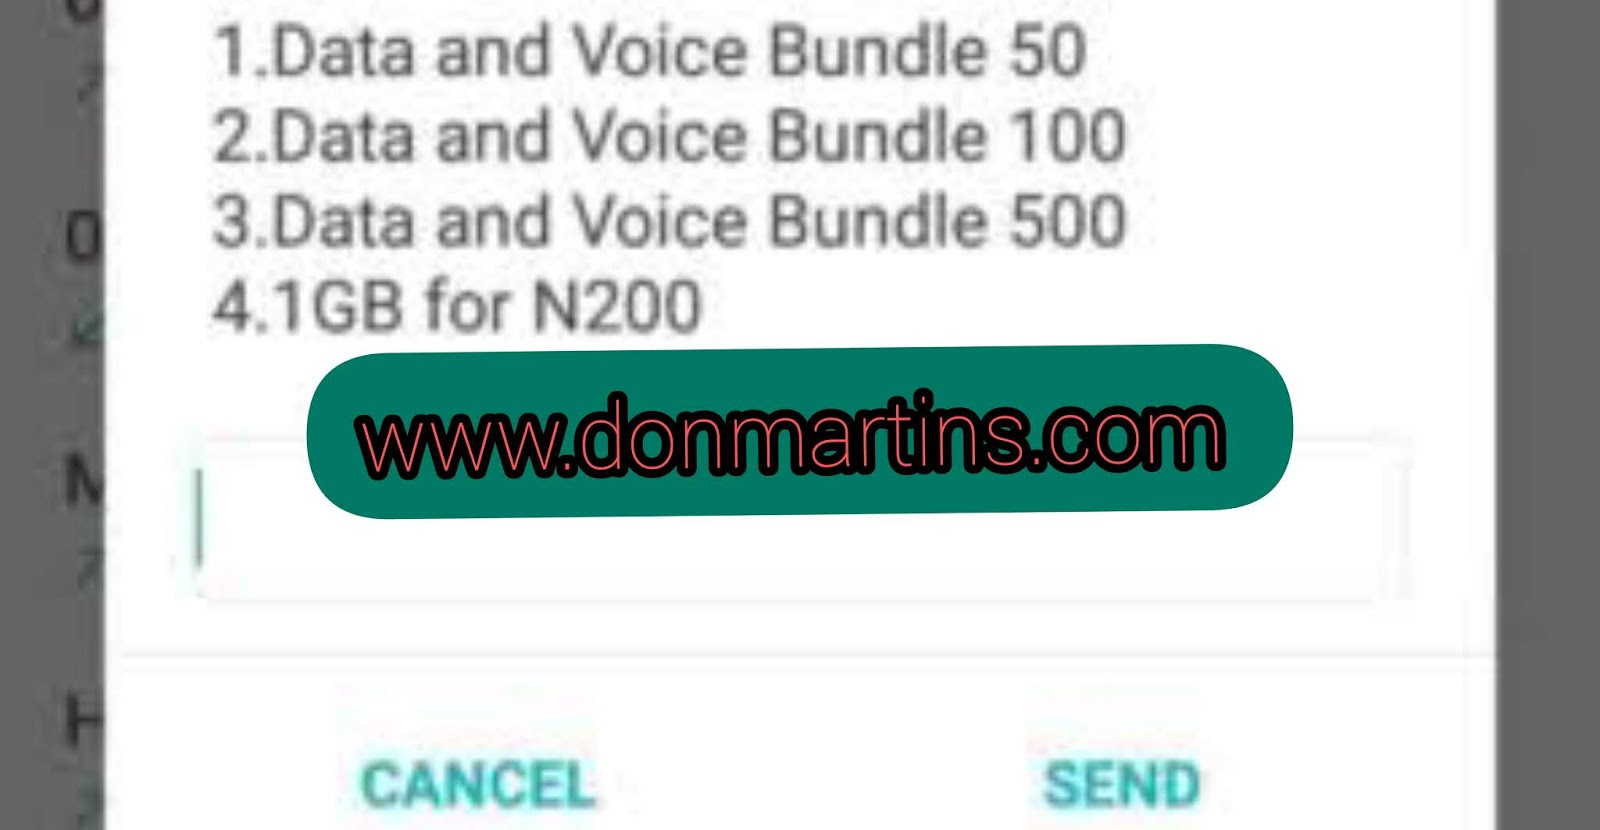 www.donmartins.com